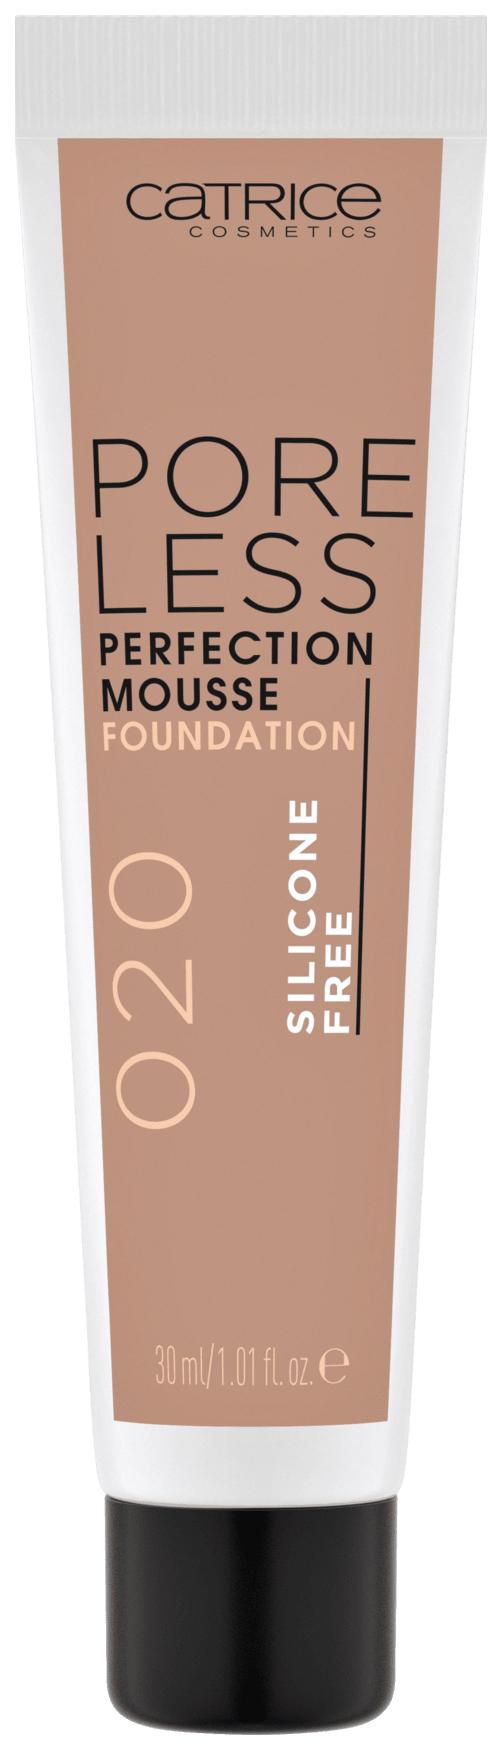 Купить Мусс тонирующий CATRICE Poreless Perfection Mousse Foundation, 30 мл, 020 Neutral Sand